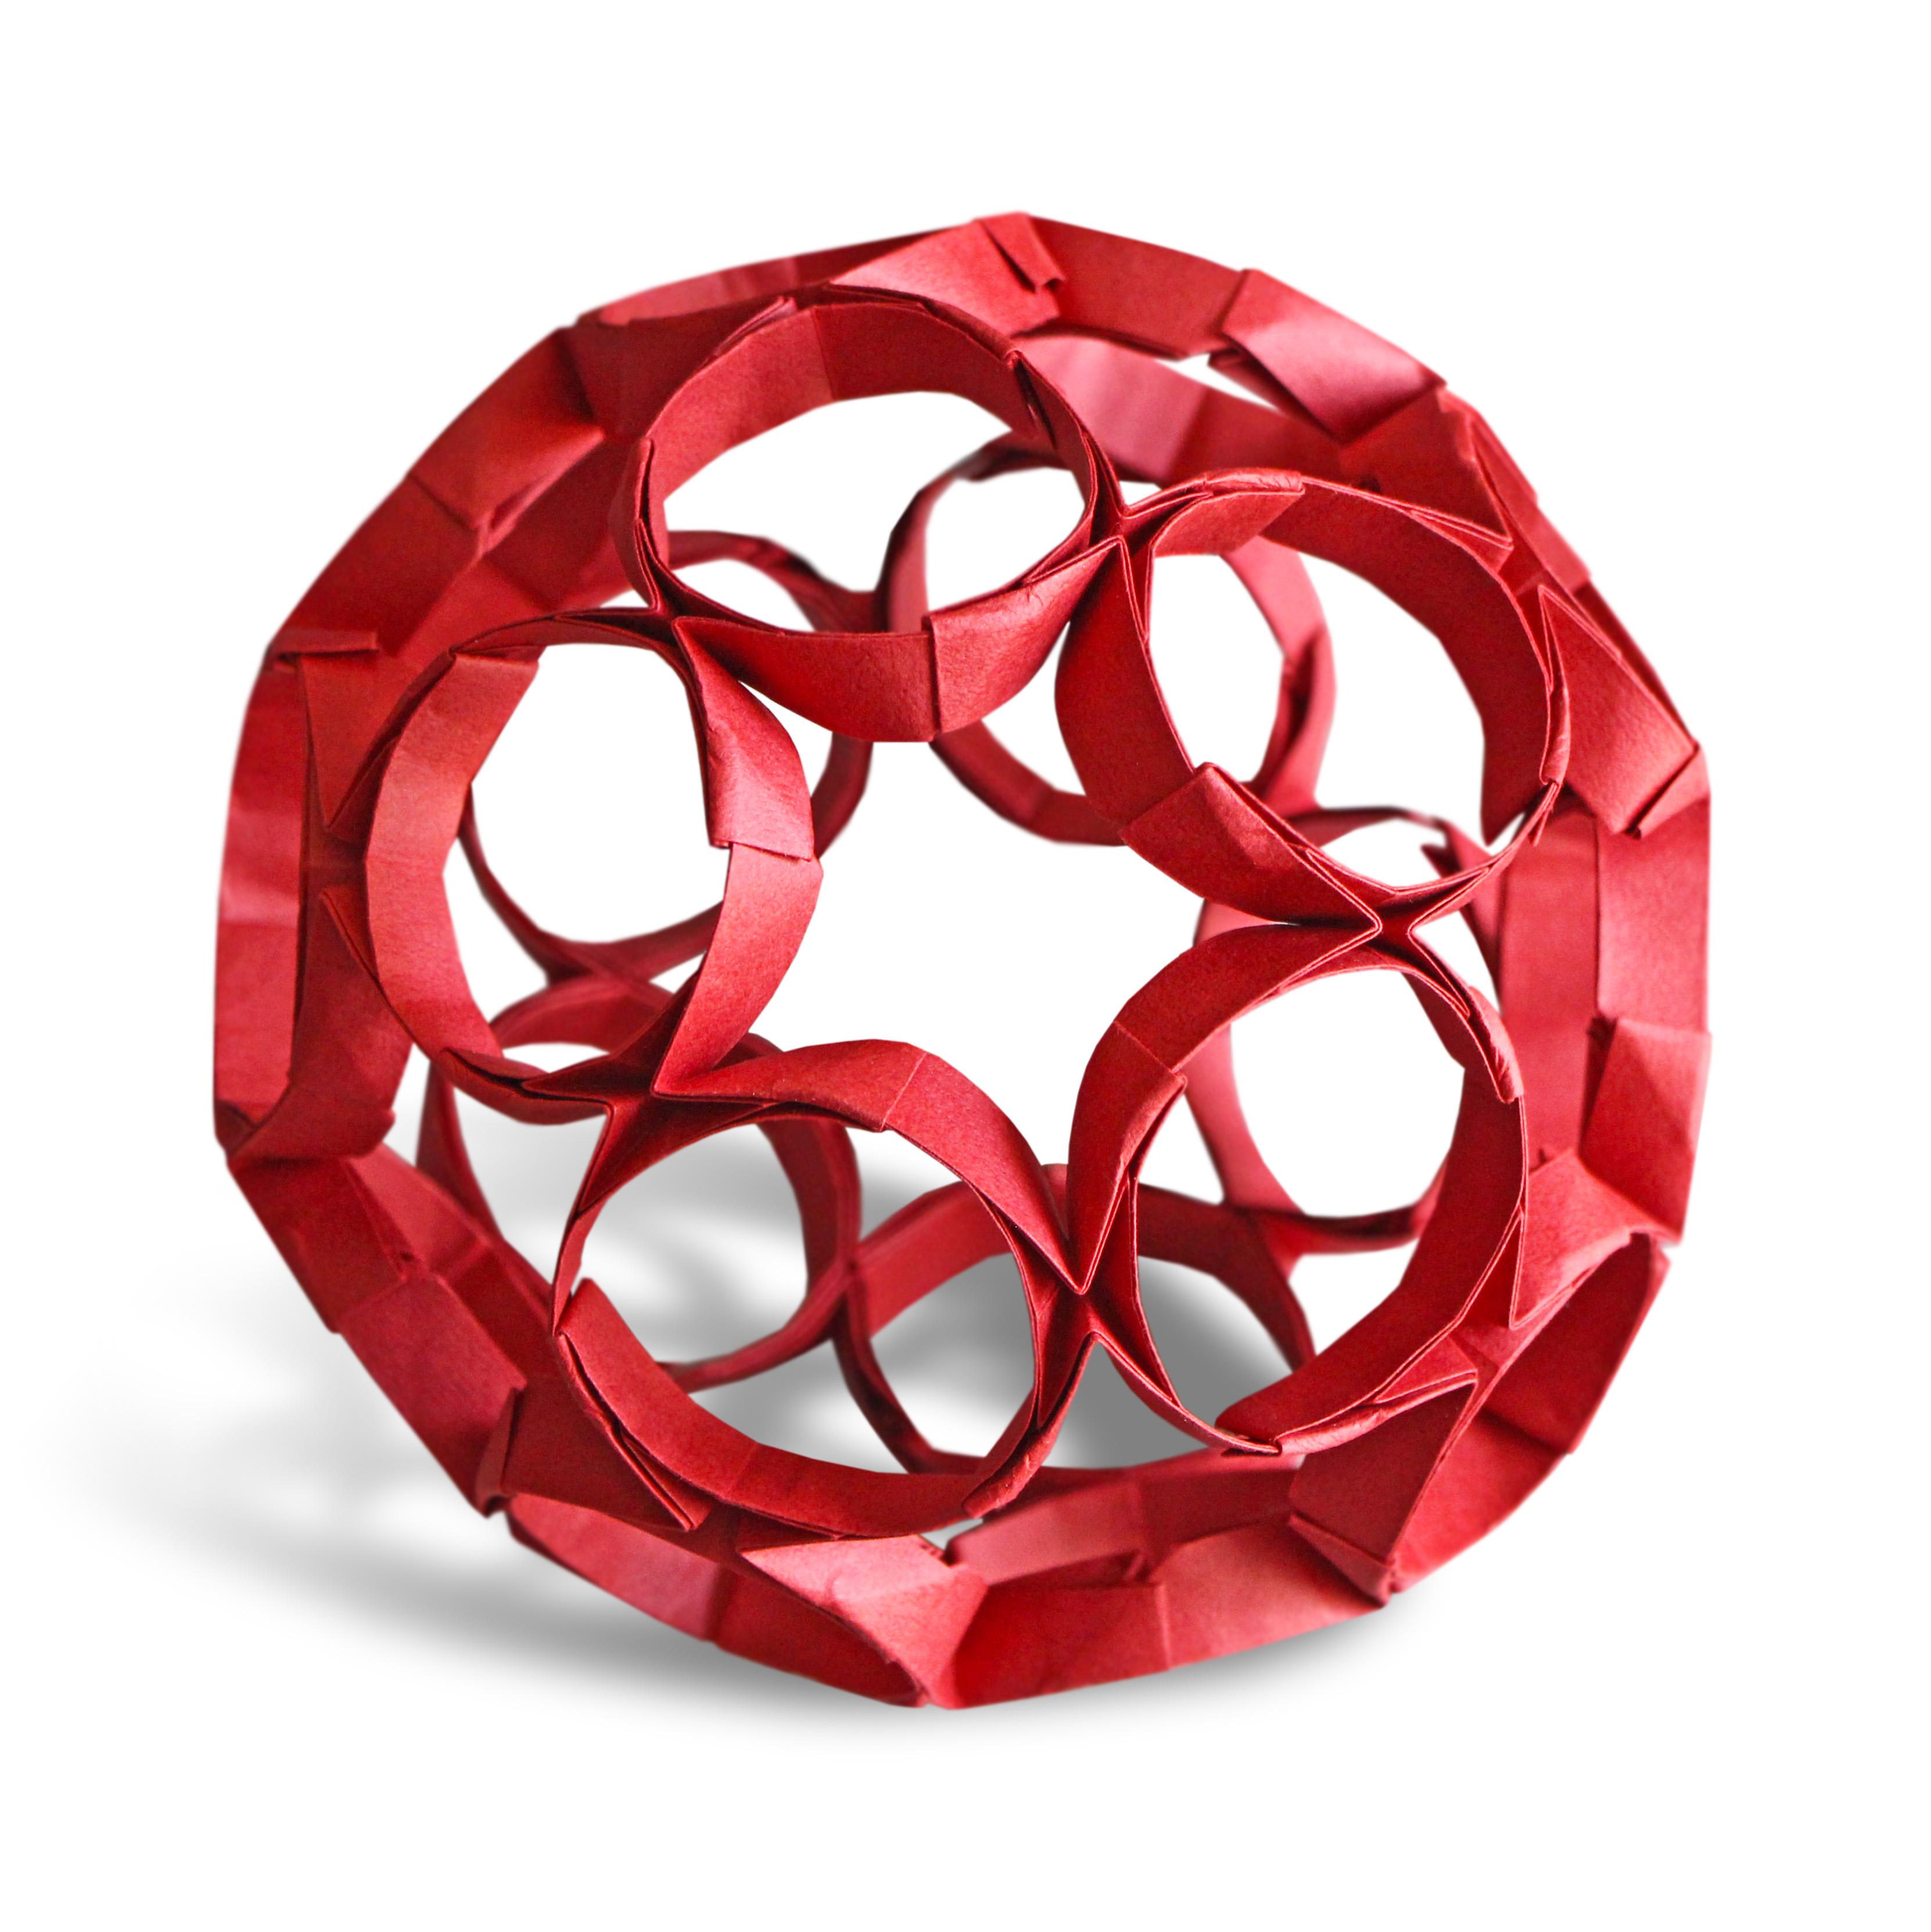 Origami Nexus Kusudama (Joseph Hwang)